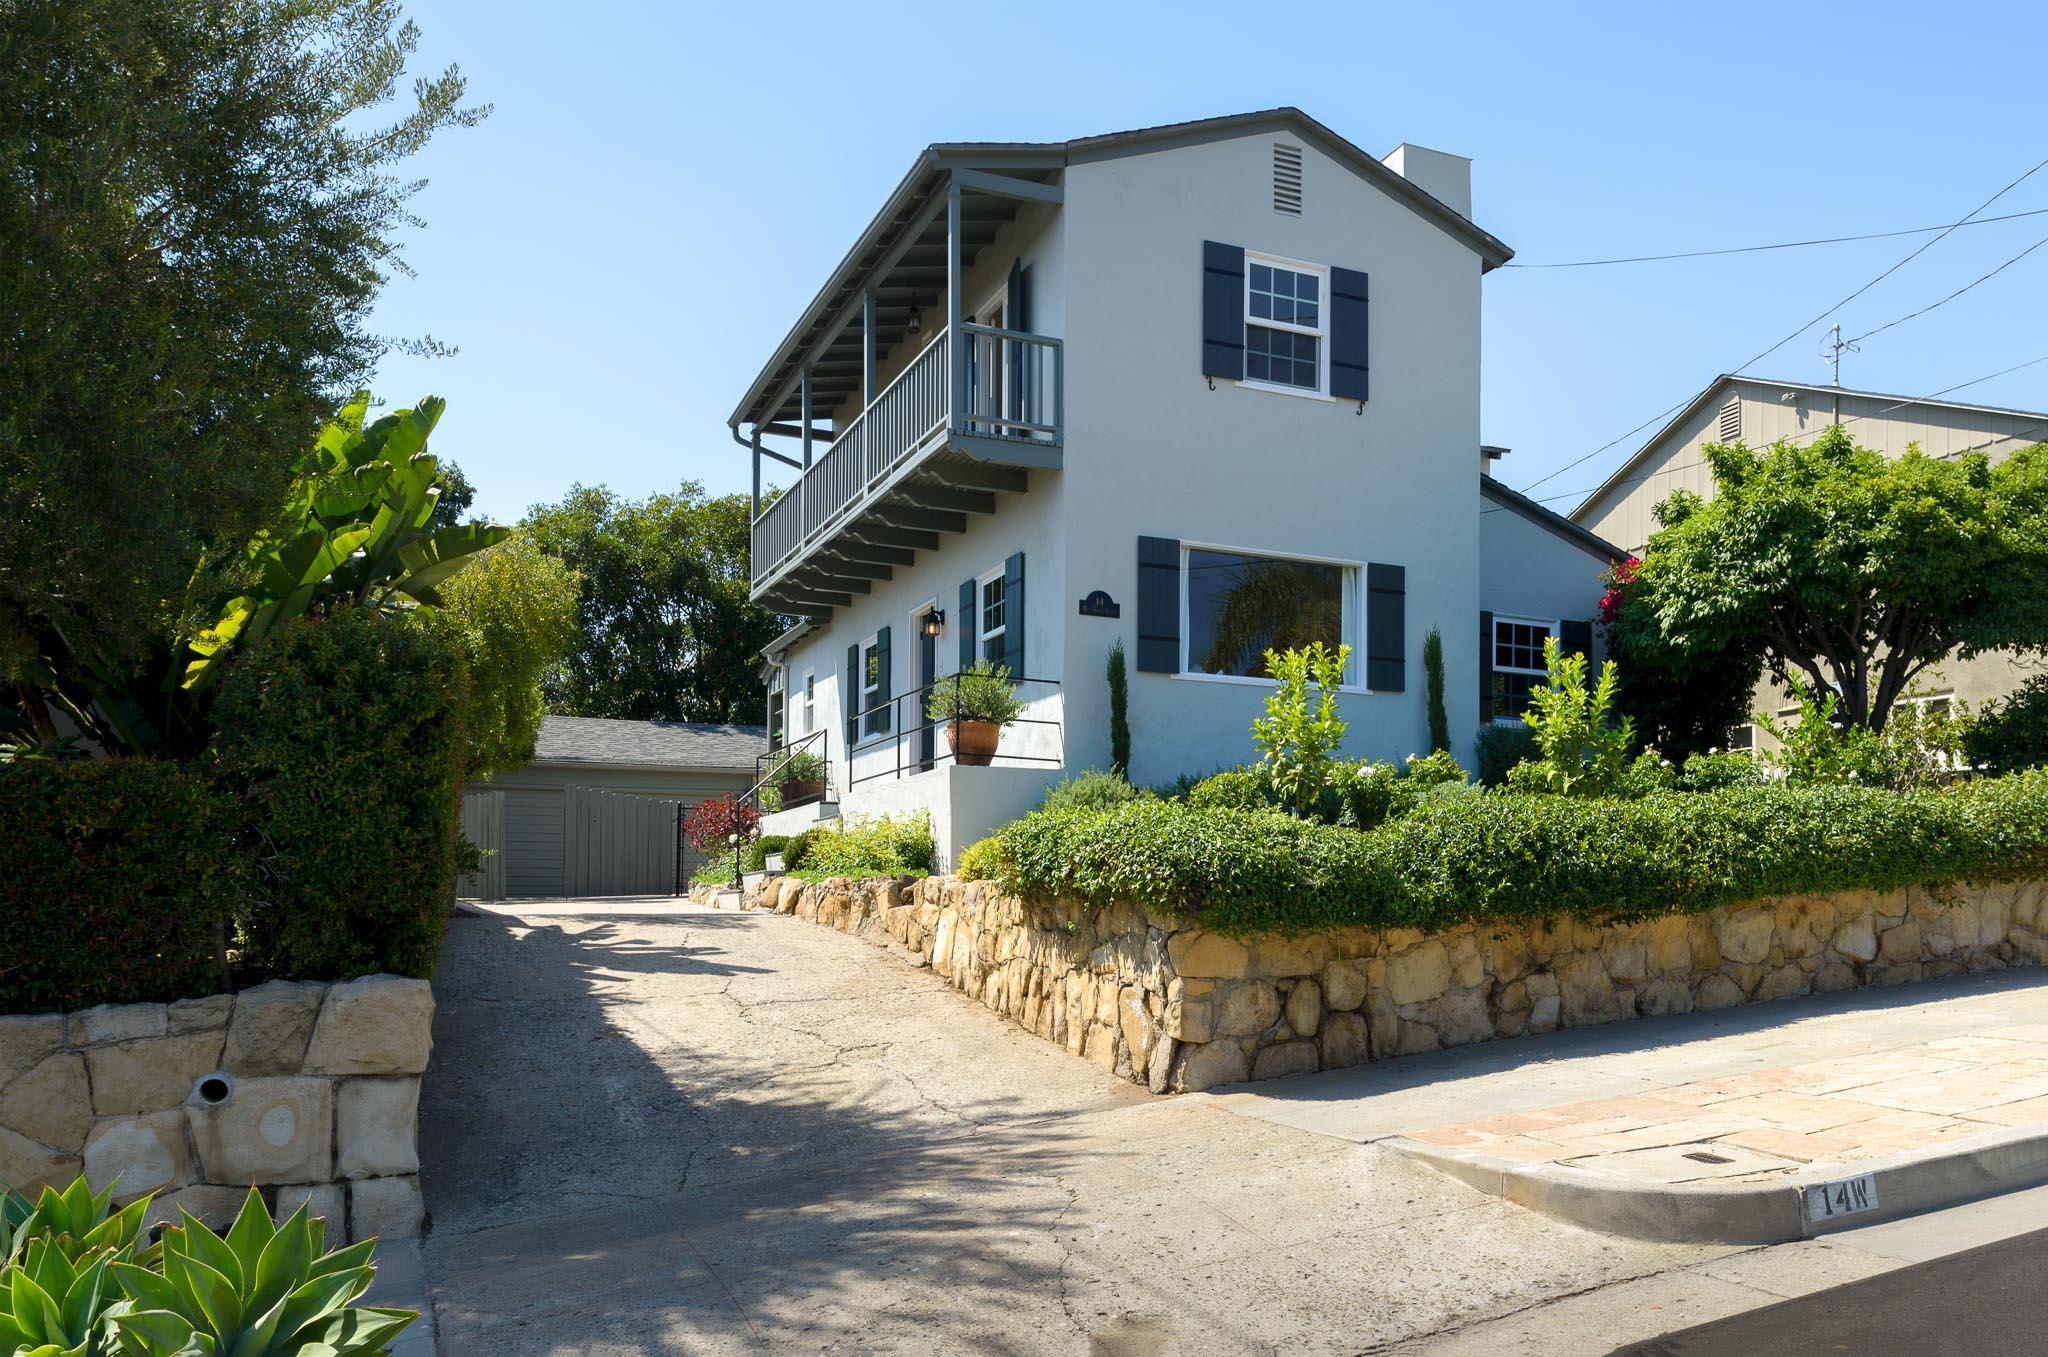 Property photo for 14 W Quinto St Santa Barbara, California 93105 - 17-2243